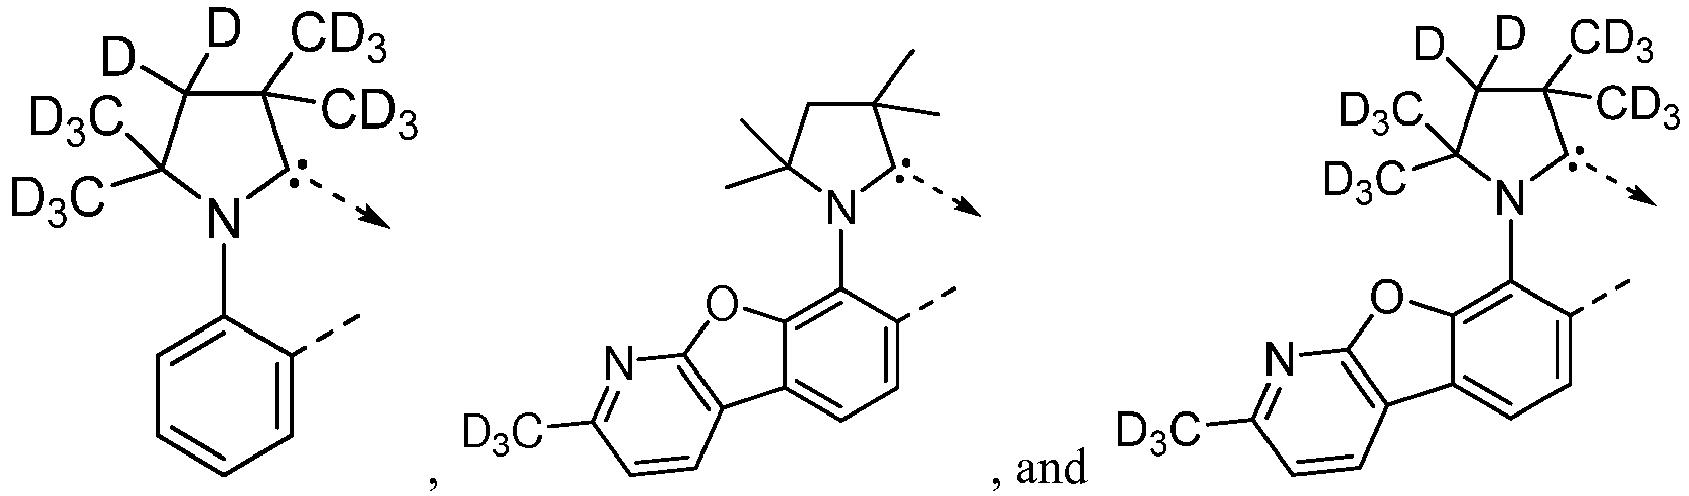 Figure imgb0972